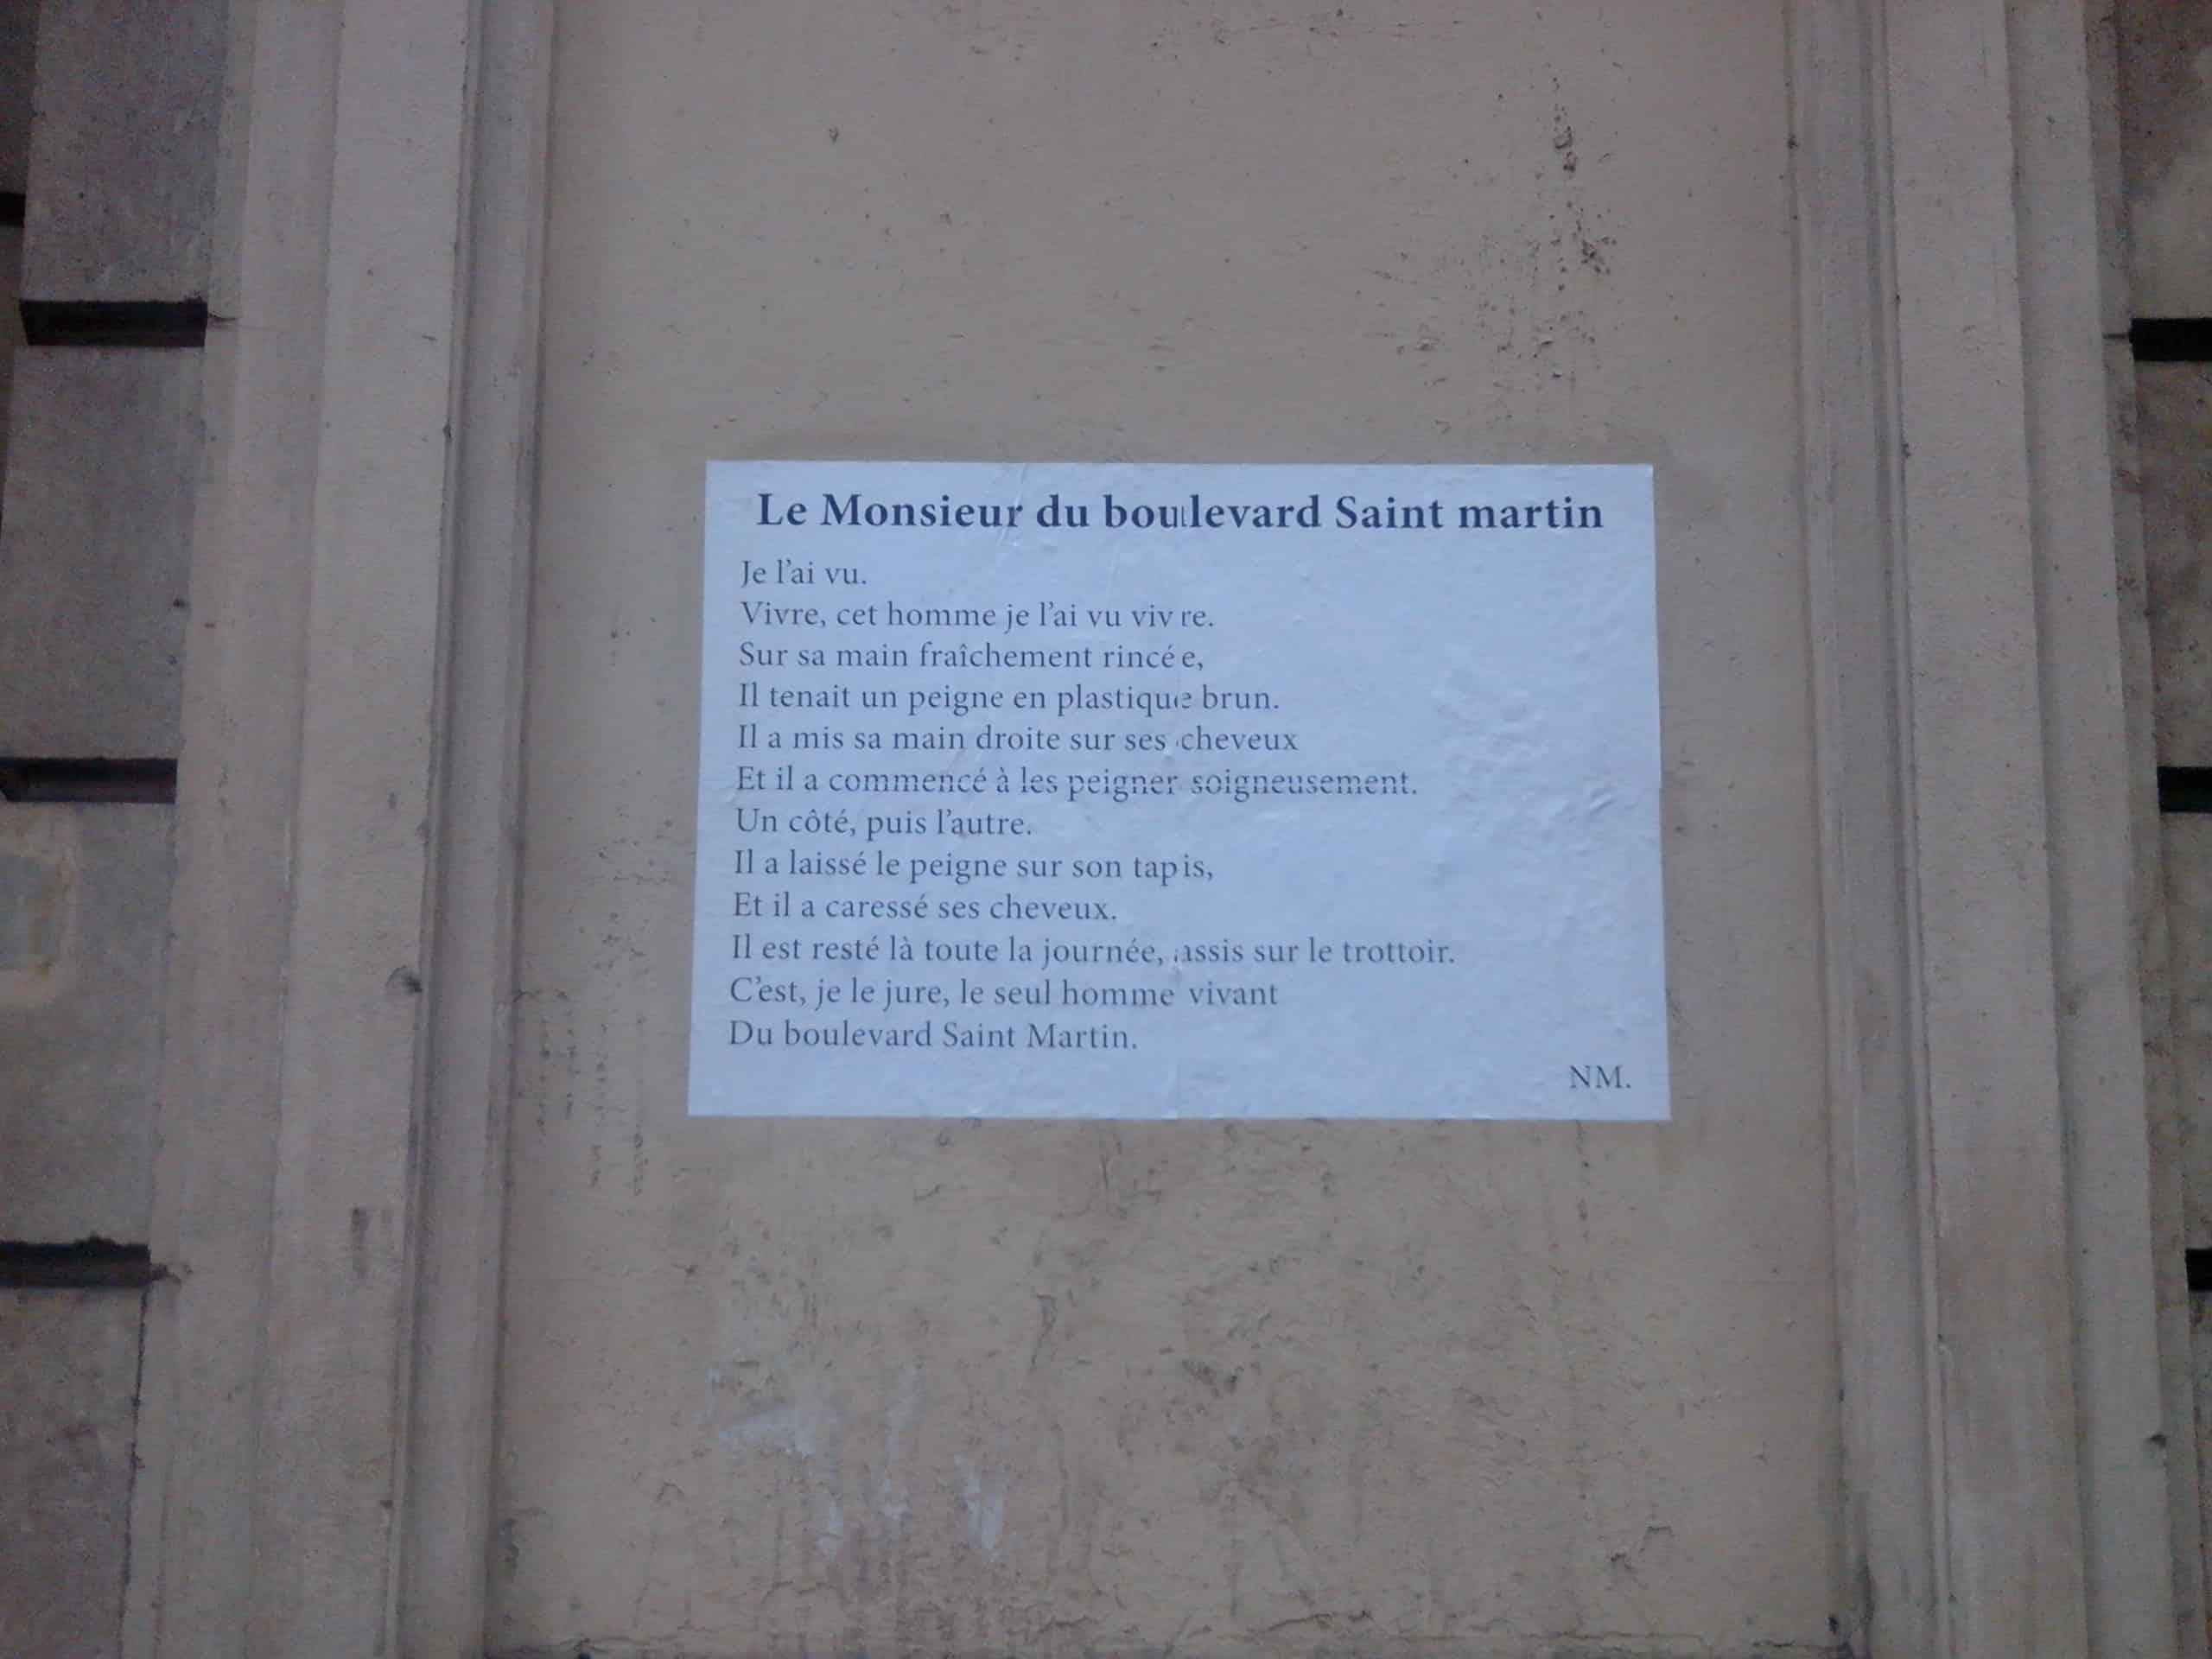 Le monsieur du boulevard saint martin, poeme, poesie, nathalie man, paris